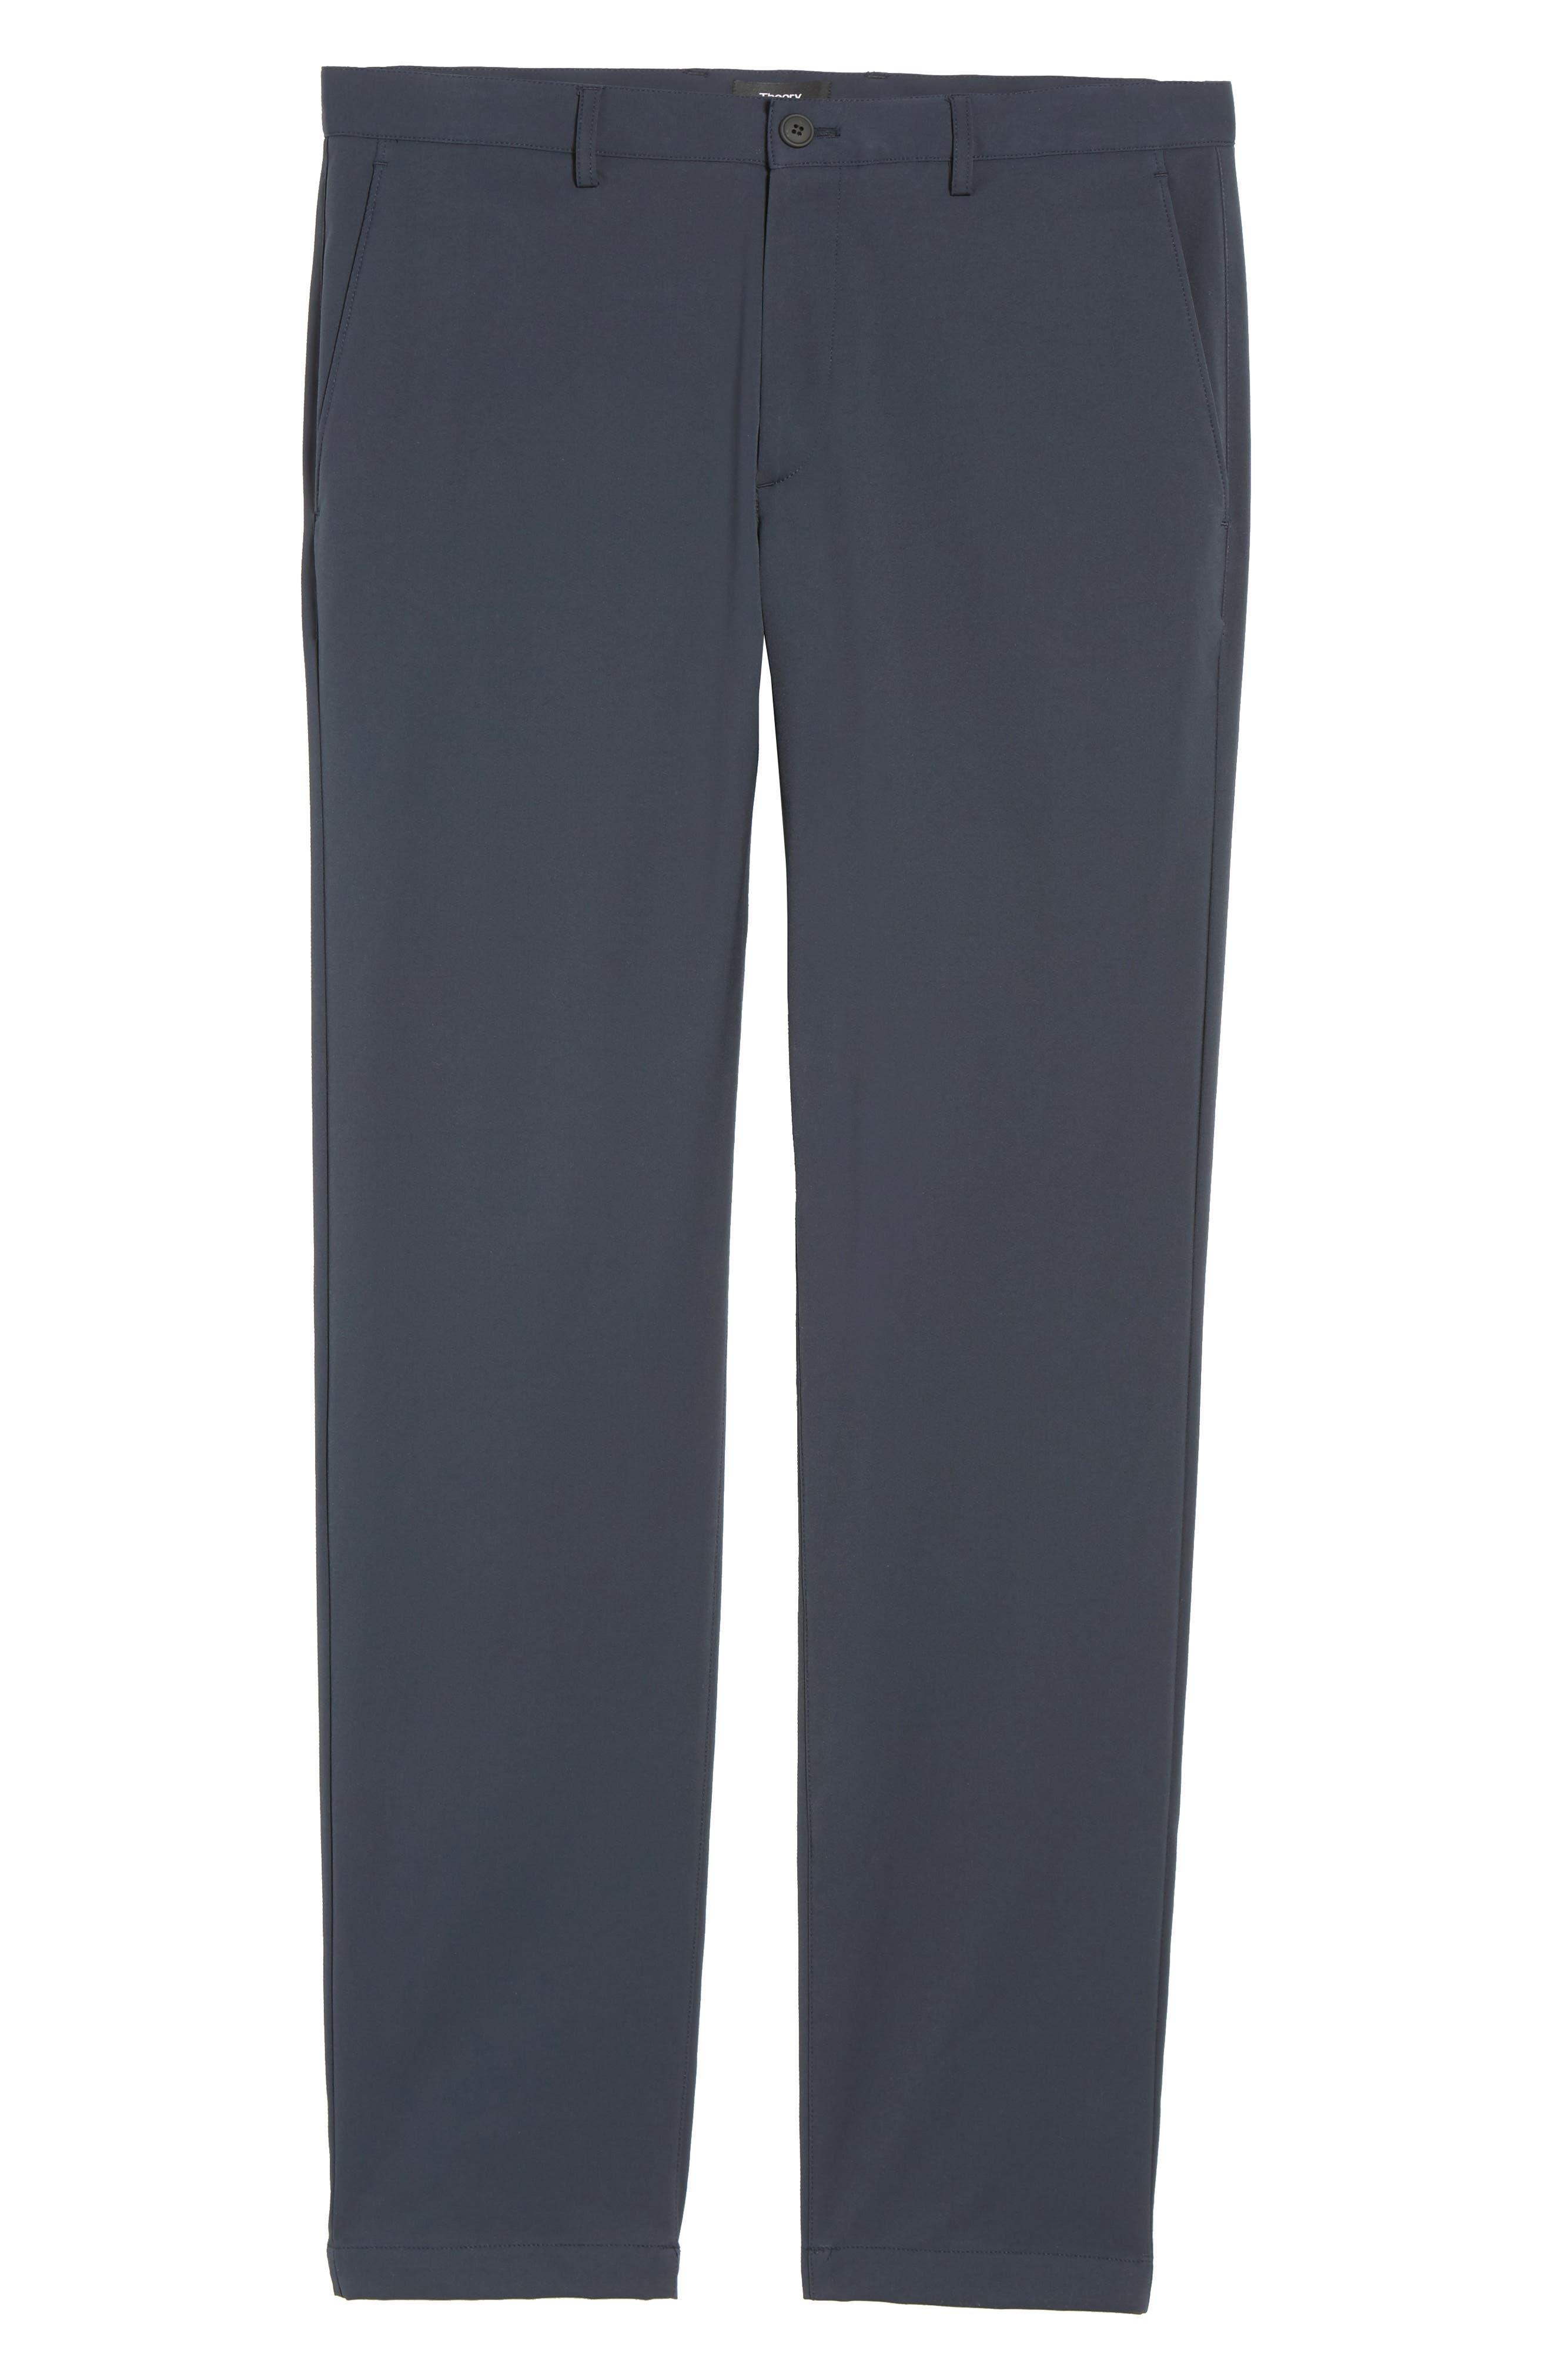 'Zaine Neoteric' Slim Fit Pants,                             Alternate thumbnail 27, color,